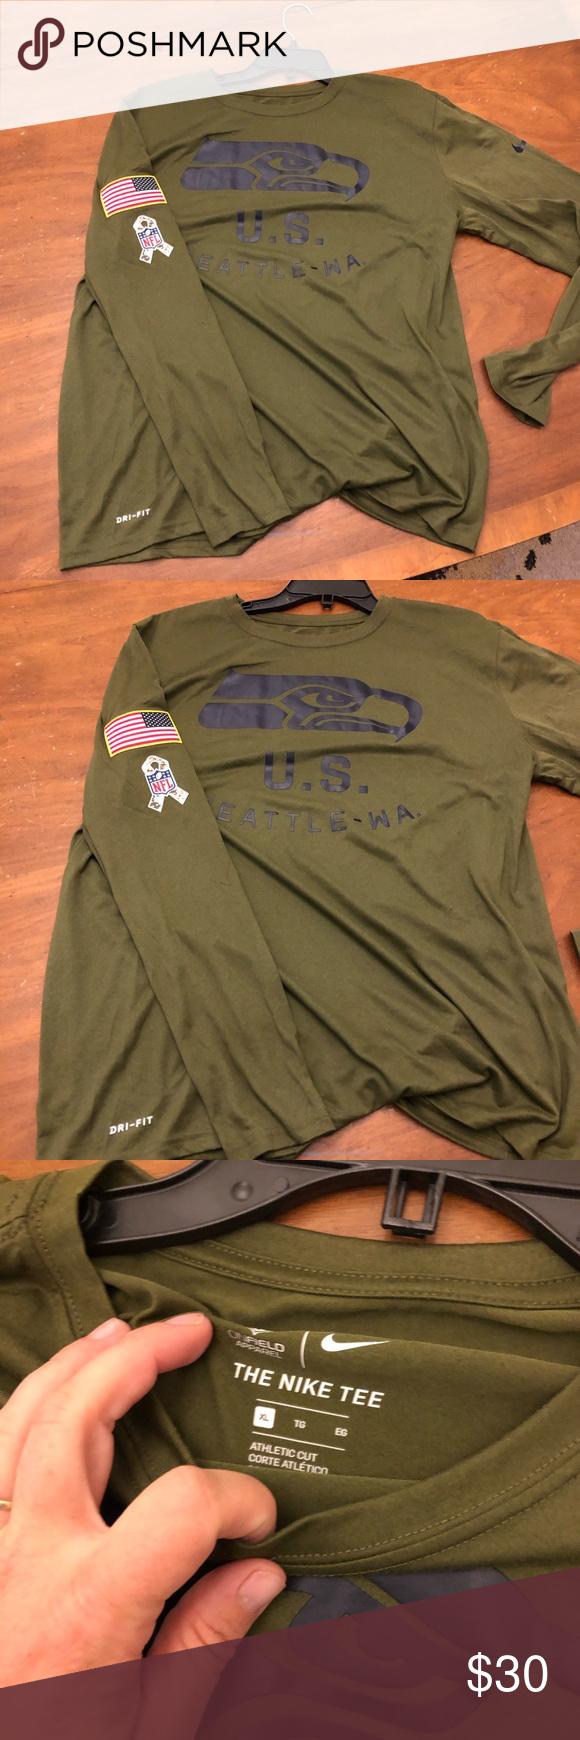 NFL NIKE SALUTE TO SERVICE SEATTLE SEAHAWKS NWT salute to service Seattle Seahawks Dri-fit Long Sleeve Shirt Nike Shirts Tees - Long Sleeve #salutetoservice NFL NIKE SALUTE TO SERVICE SEATTLE SEAHAWKS NWT salute to service Seattle Seahawks Dri-fit Long Sleeve Shirt Nike Shirts Tees - Long Sleeve #salutetoservice